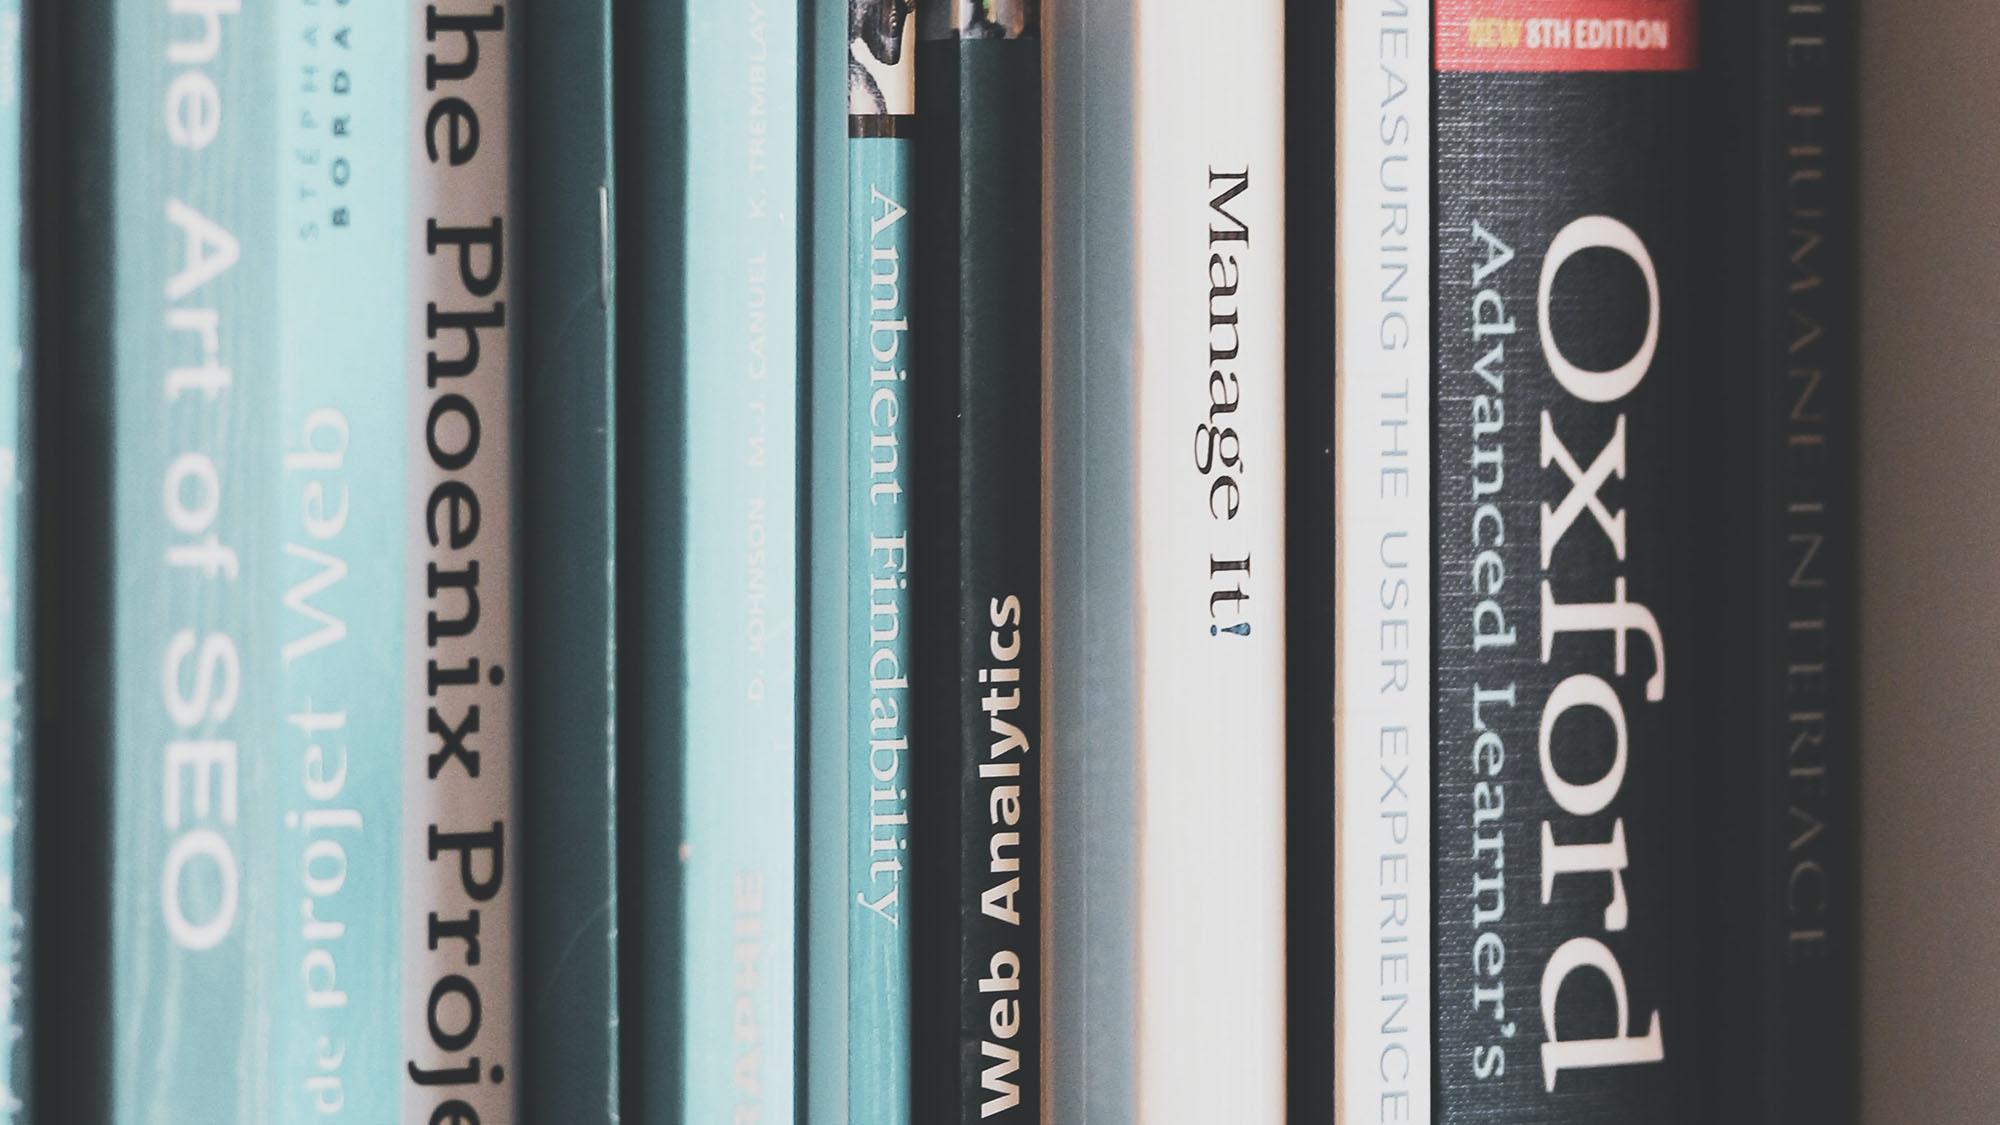 Stack of books on a bookshelf